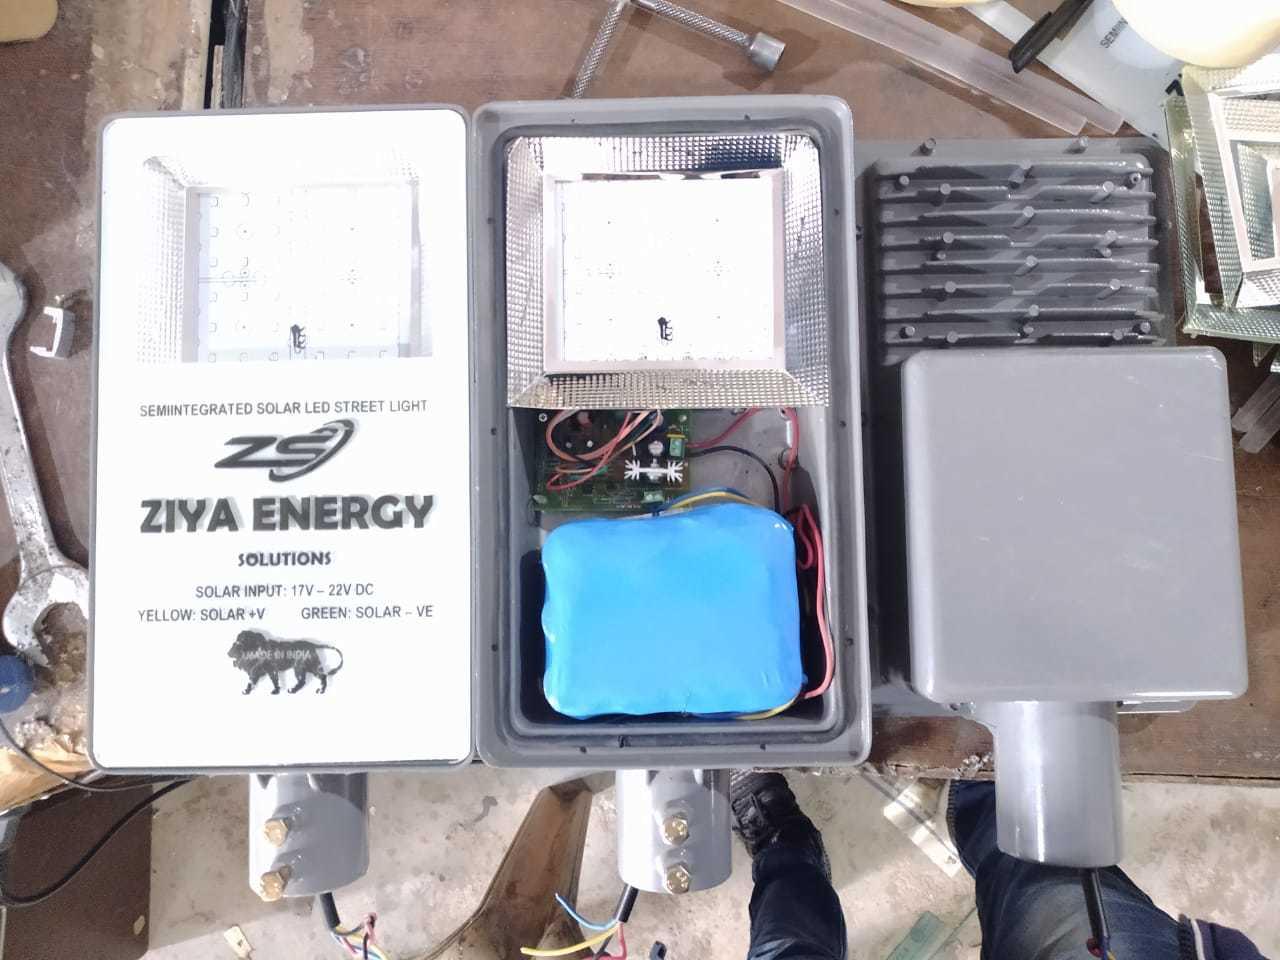 12 Watts Semi Integrated Solar Street Light - LiPo4 Battery